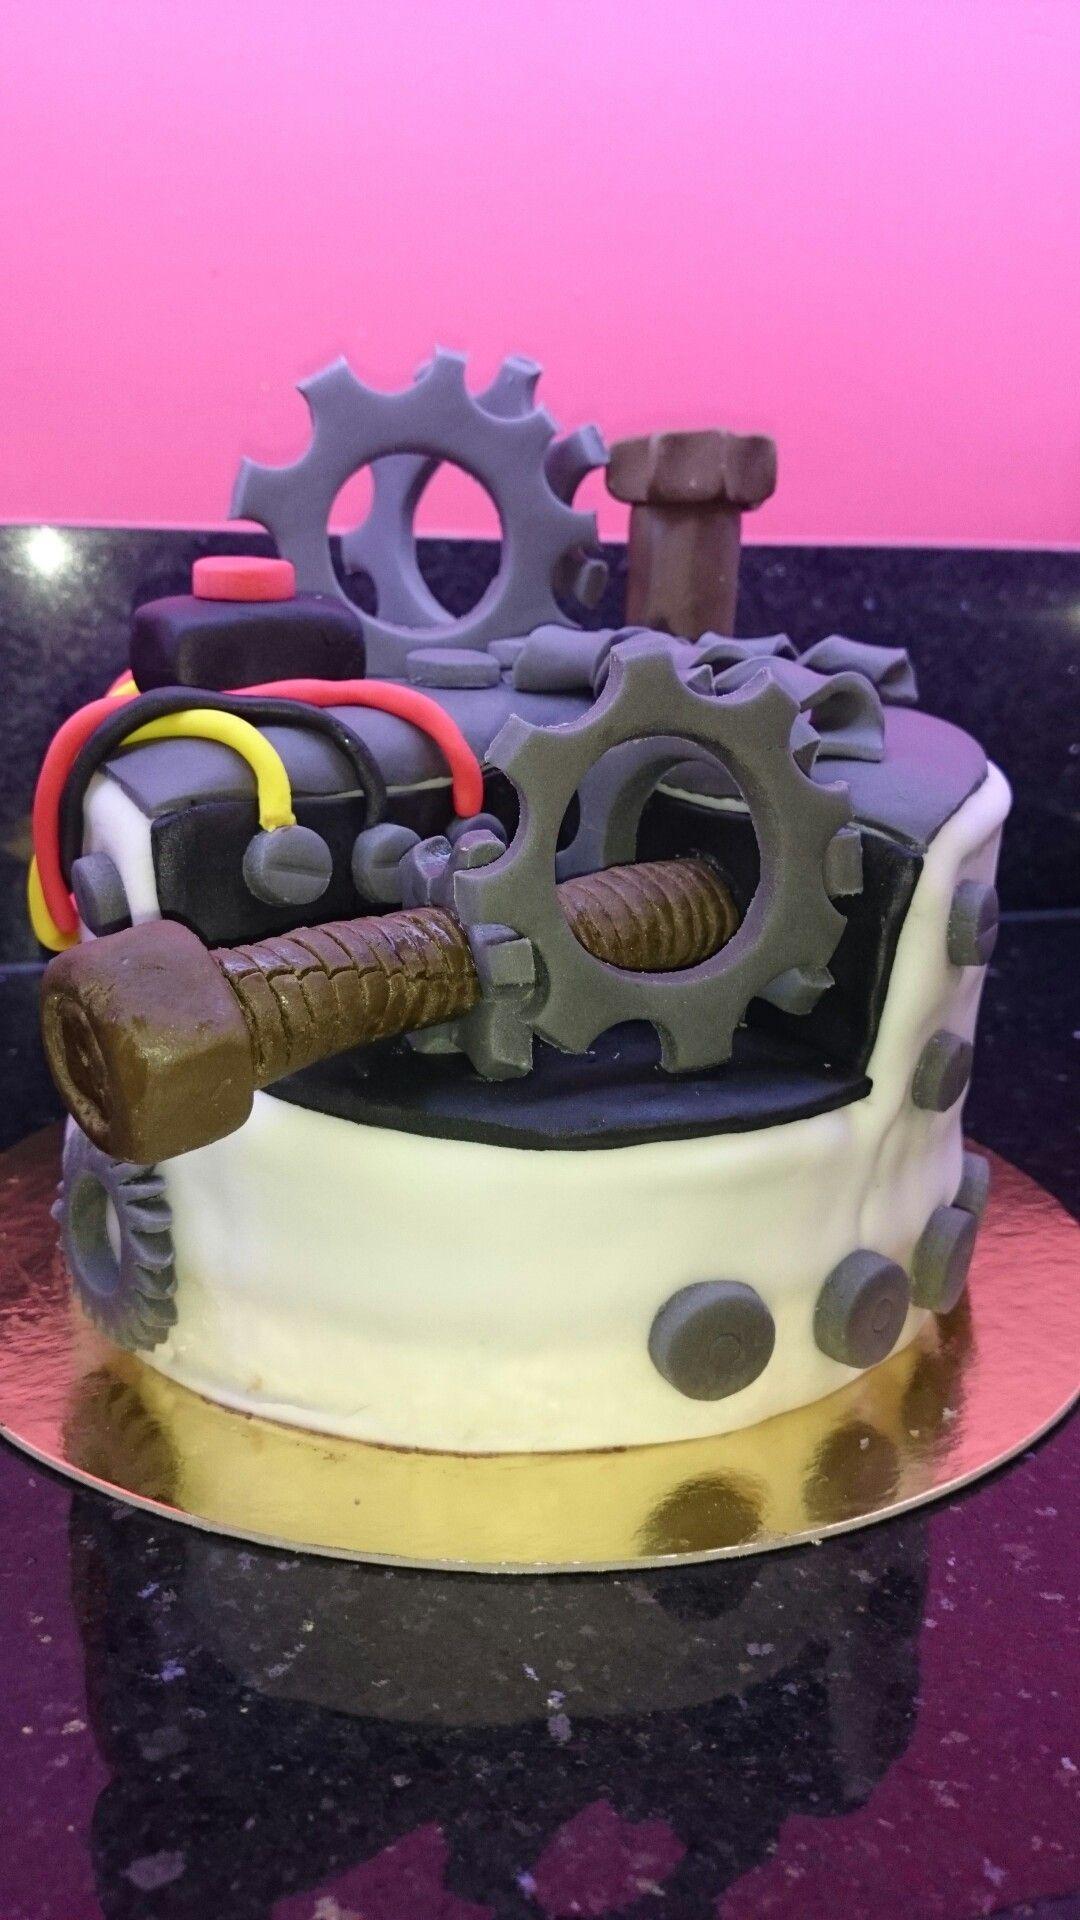 Engineering 70th birthday cake for my fatherinlaw npady S